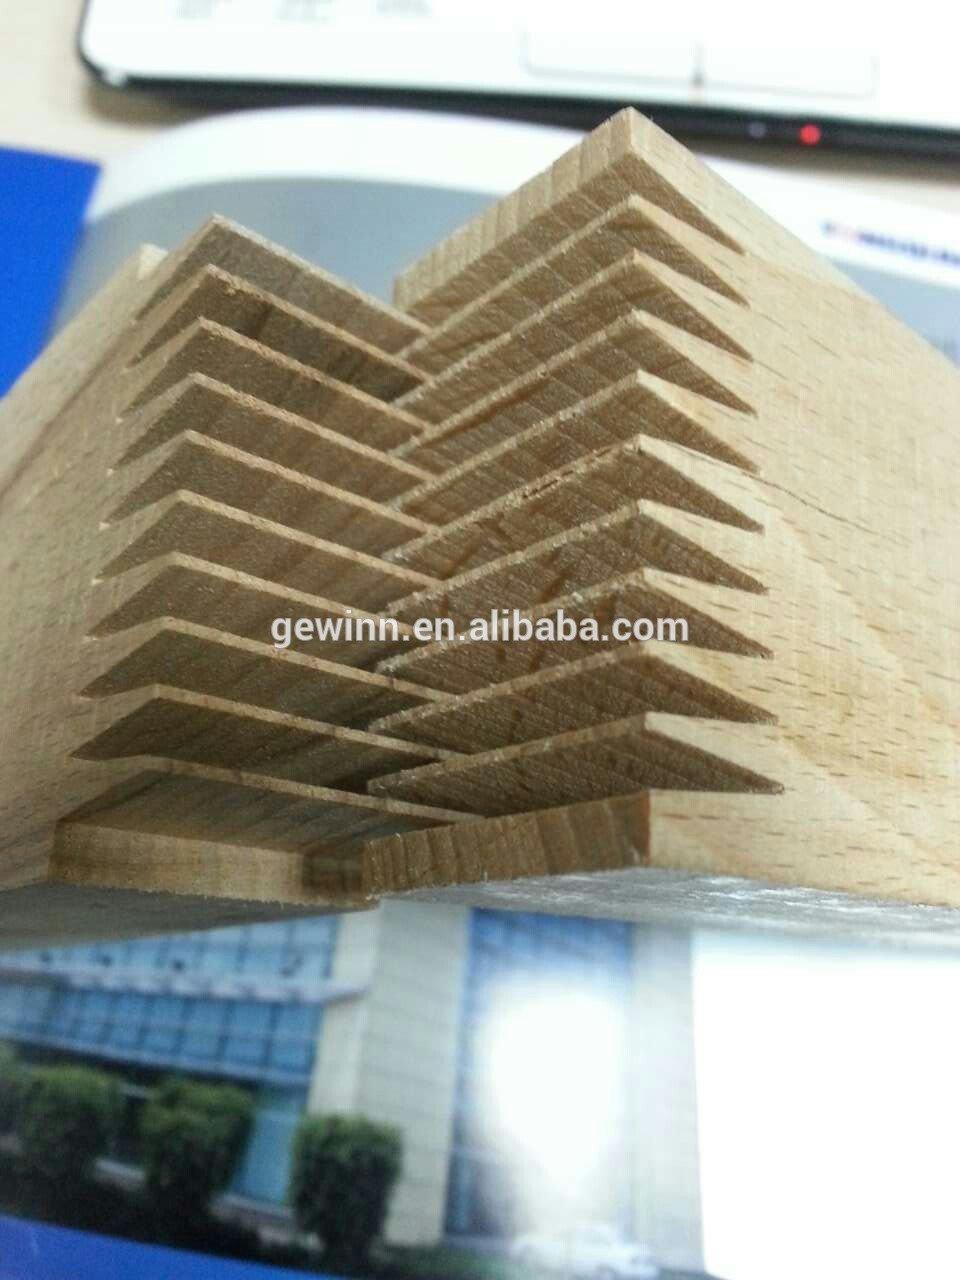 woodworking tools and accessories single head 3.5kw woodworking cnc machine Gewinn Warranty